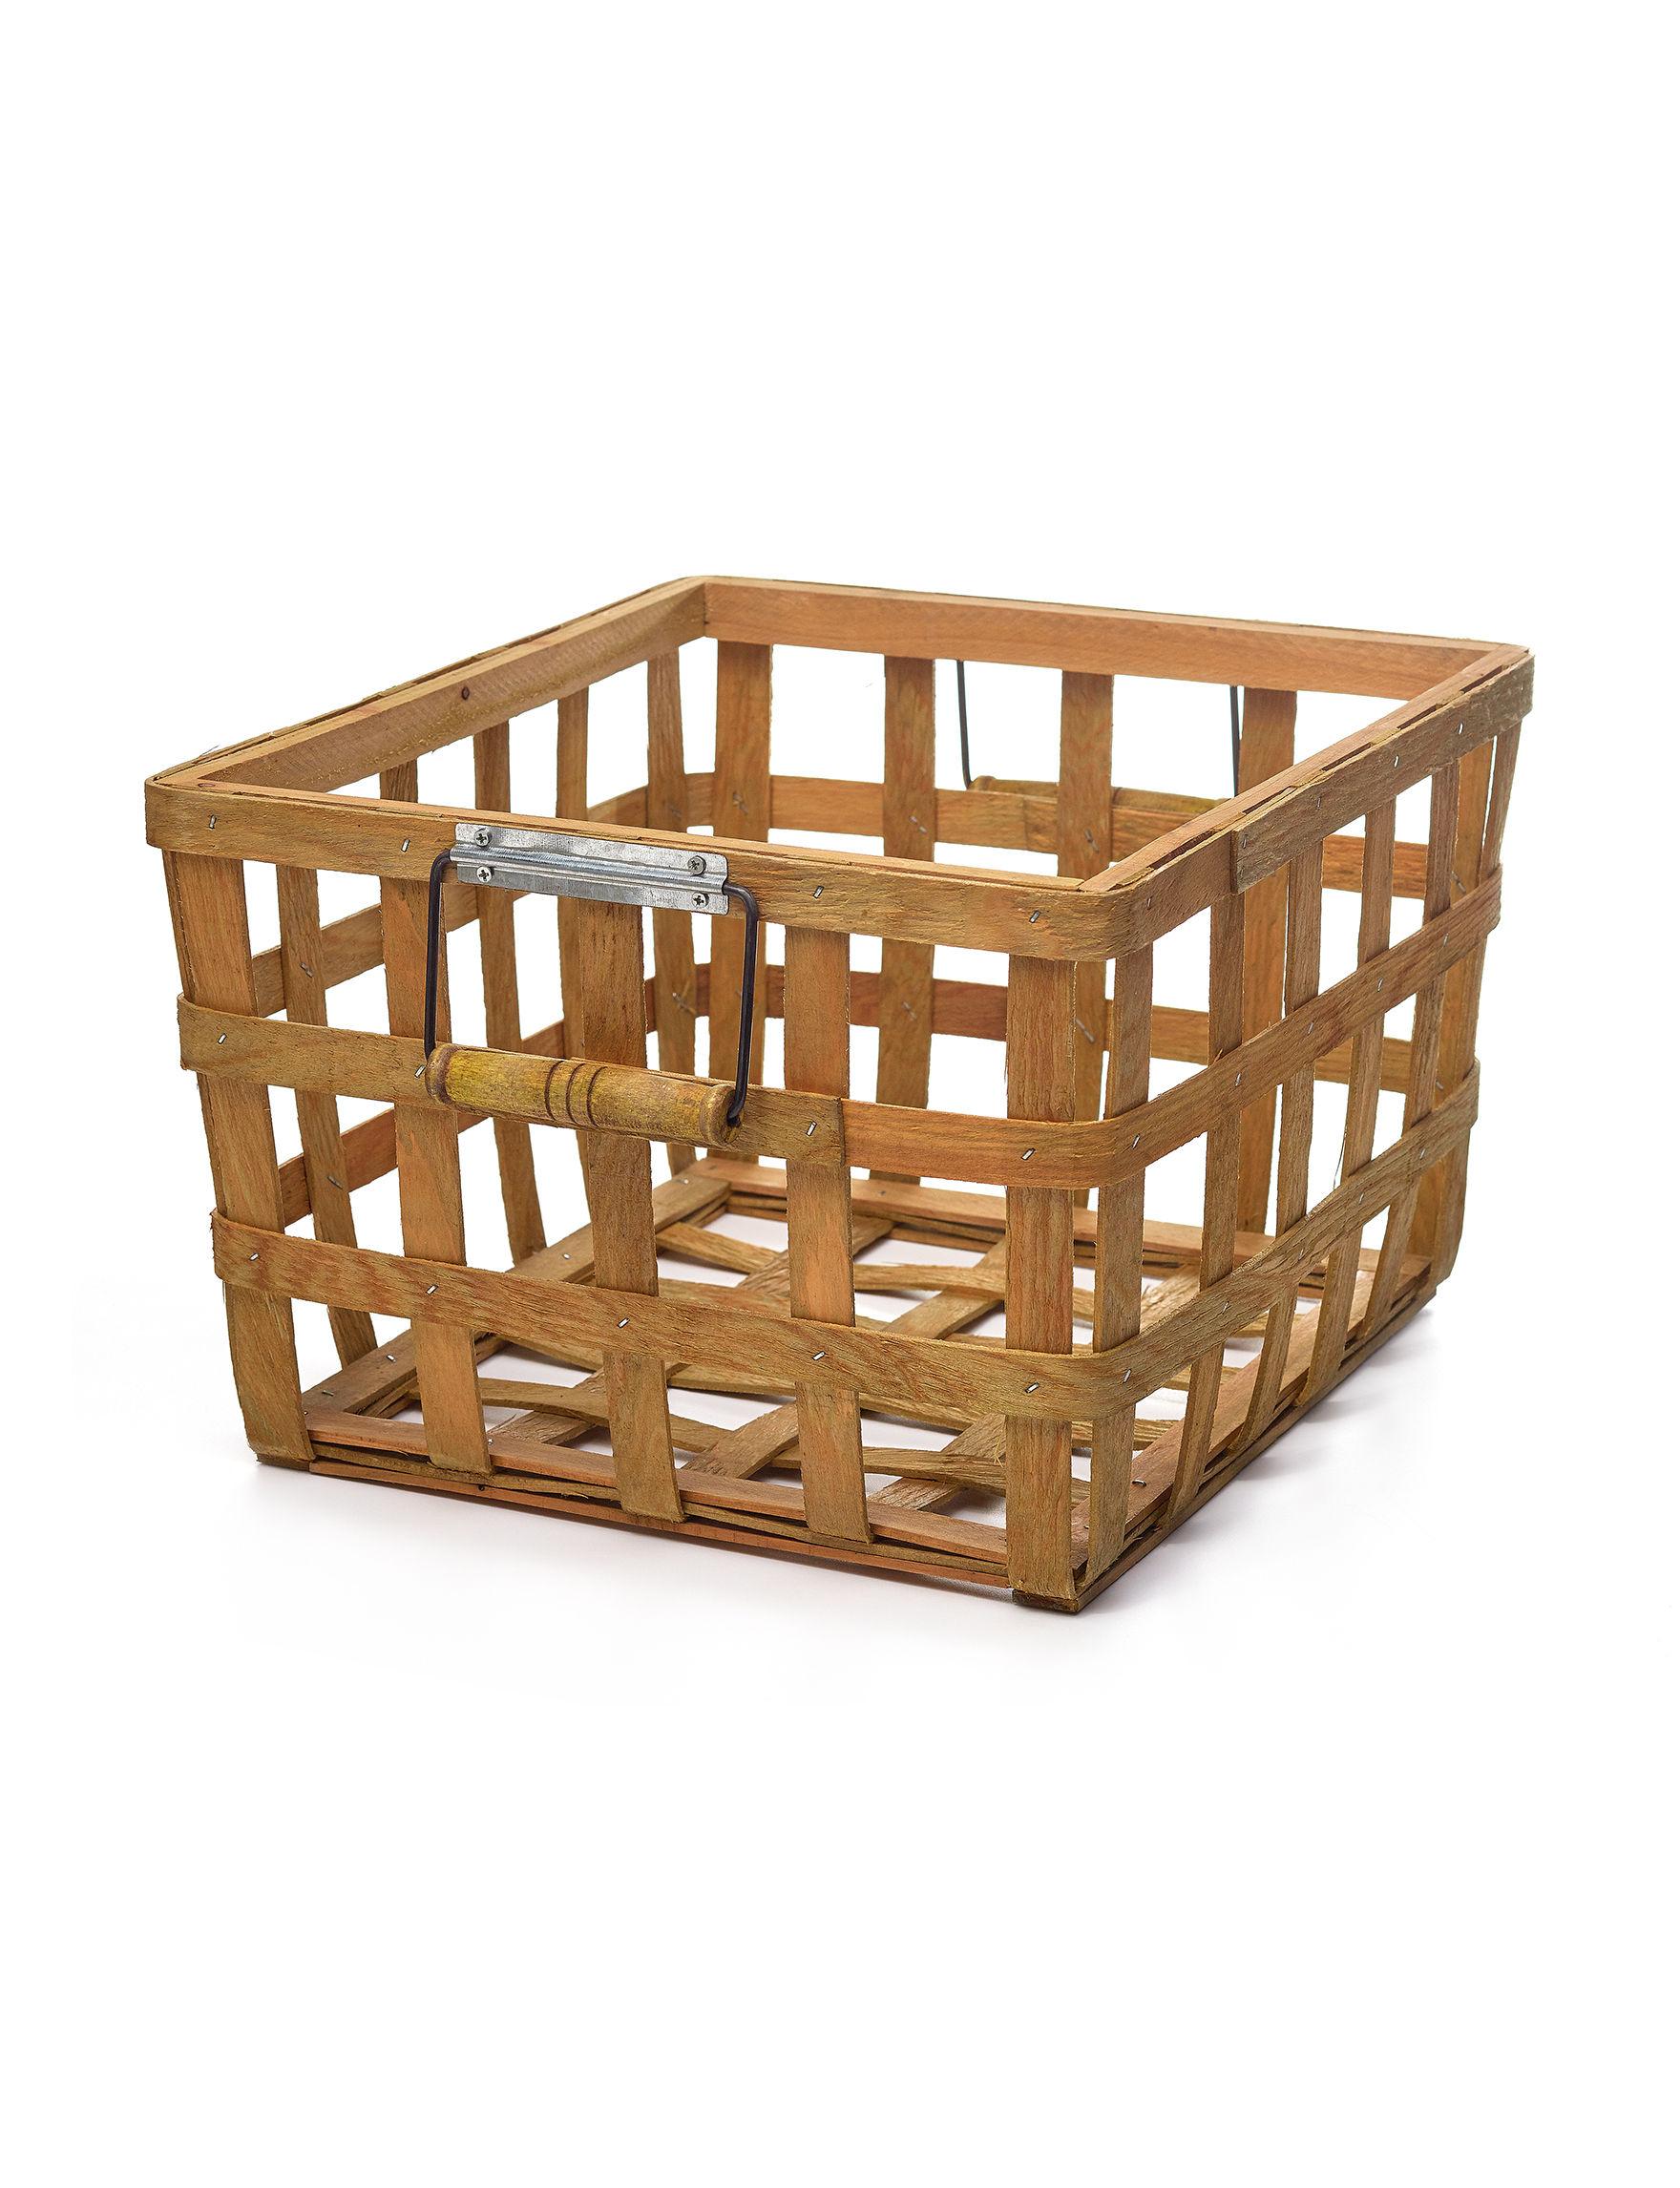 Enchante Wood Baskets Storage & Organization